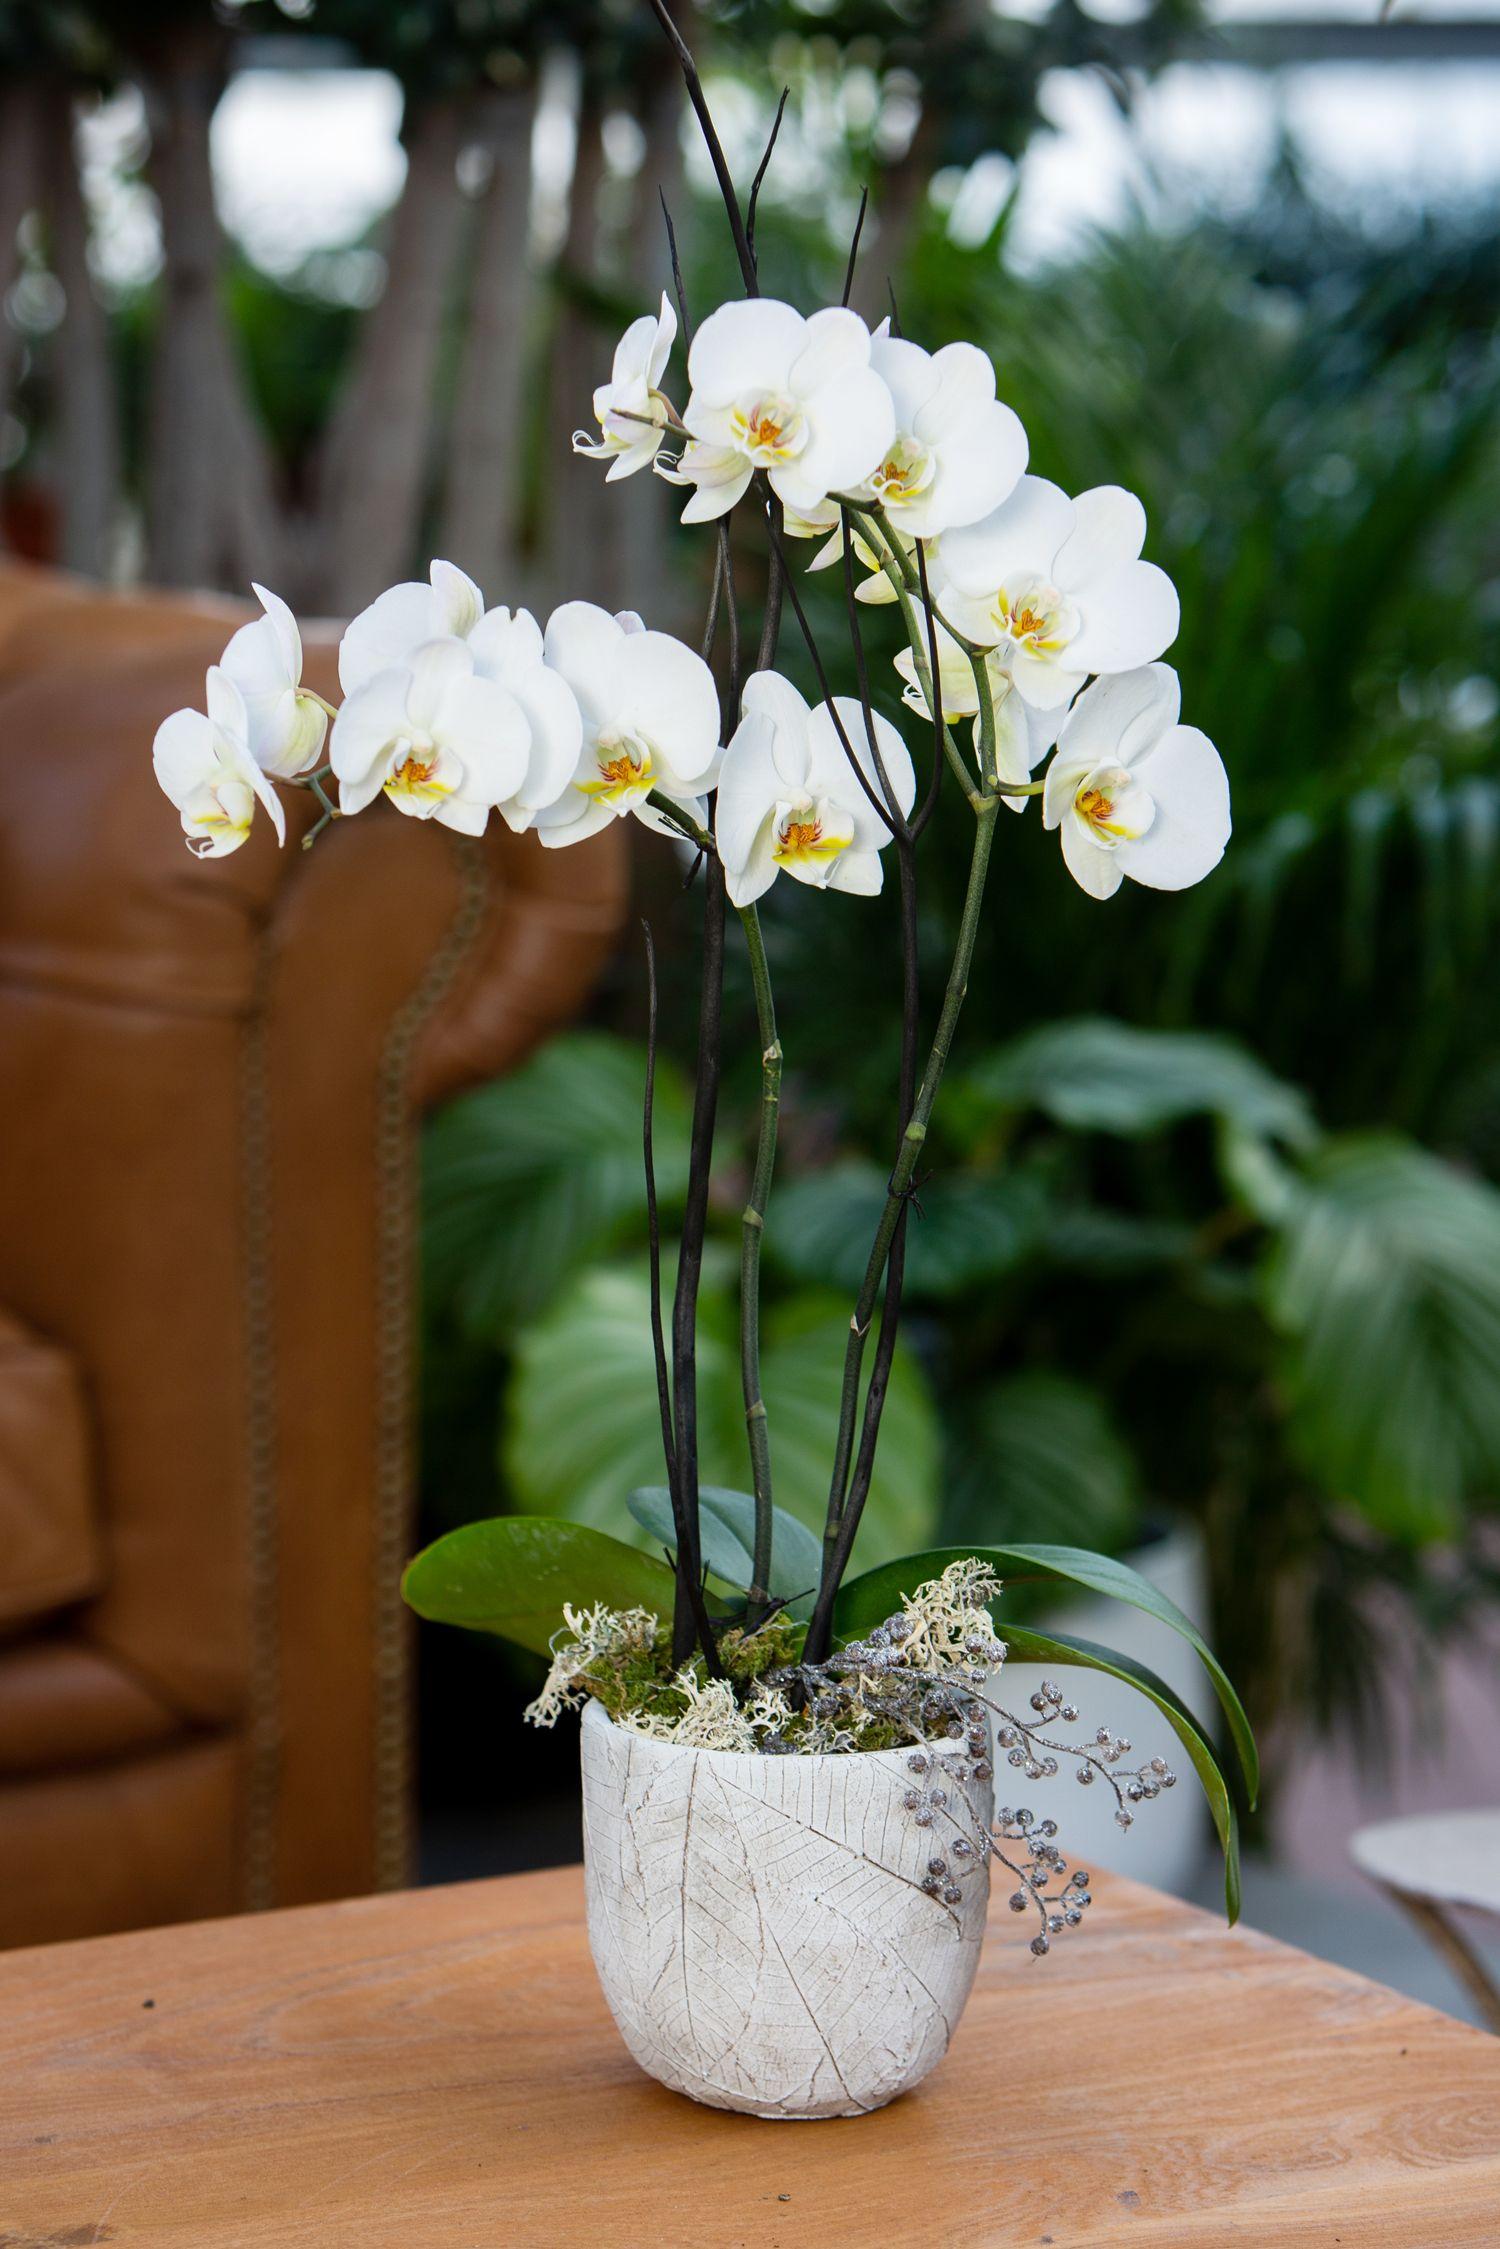 L Orchidee Phalaenopsis Plante Fleur Blanche Orchidee Blanche Photo Orchidee